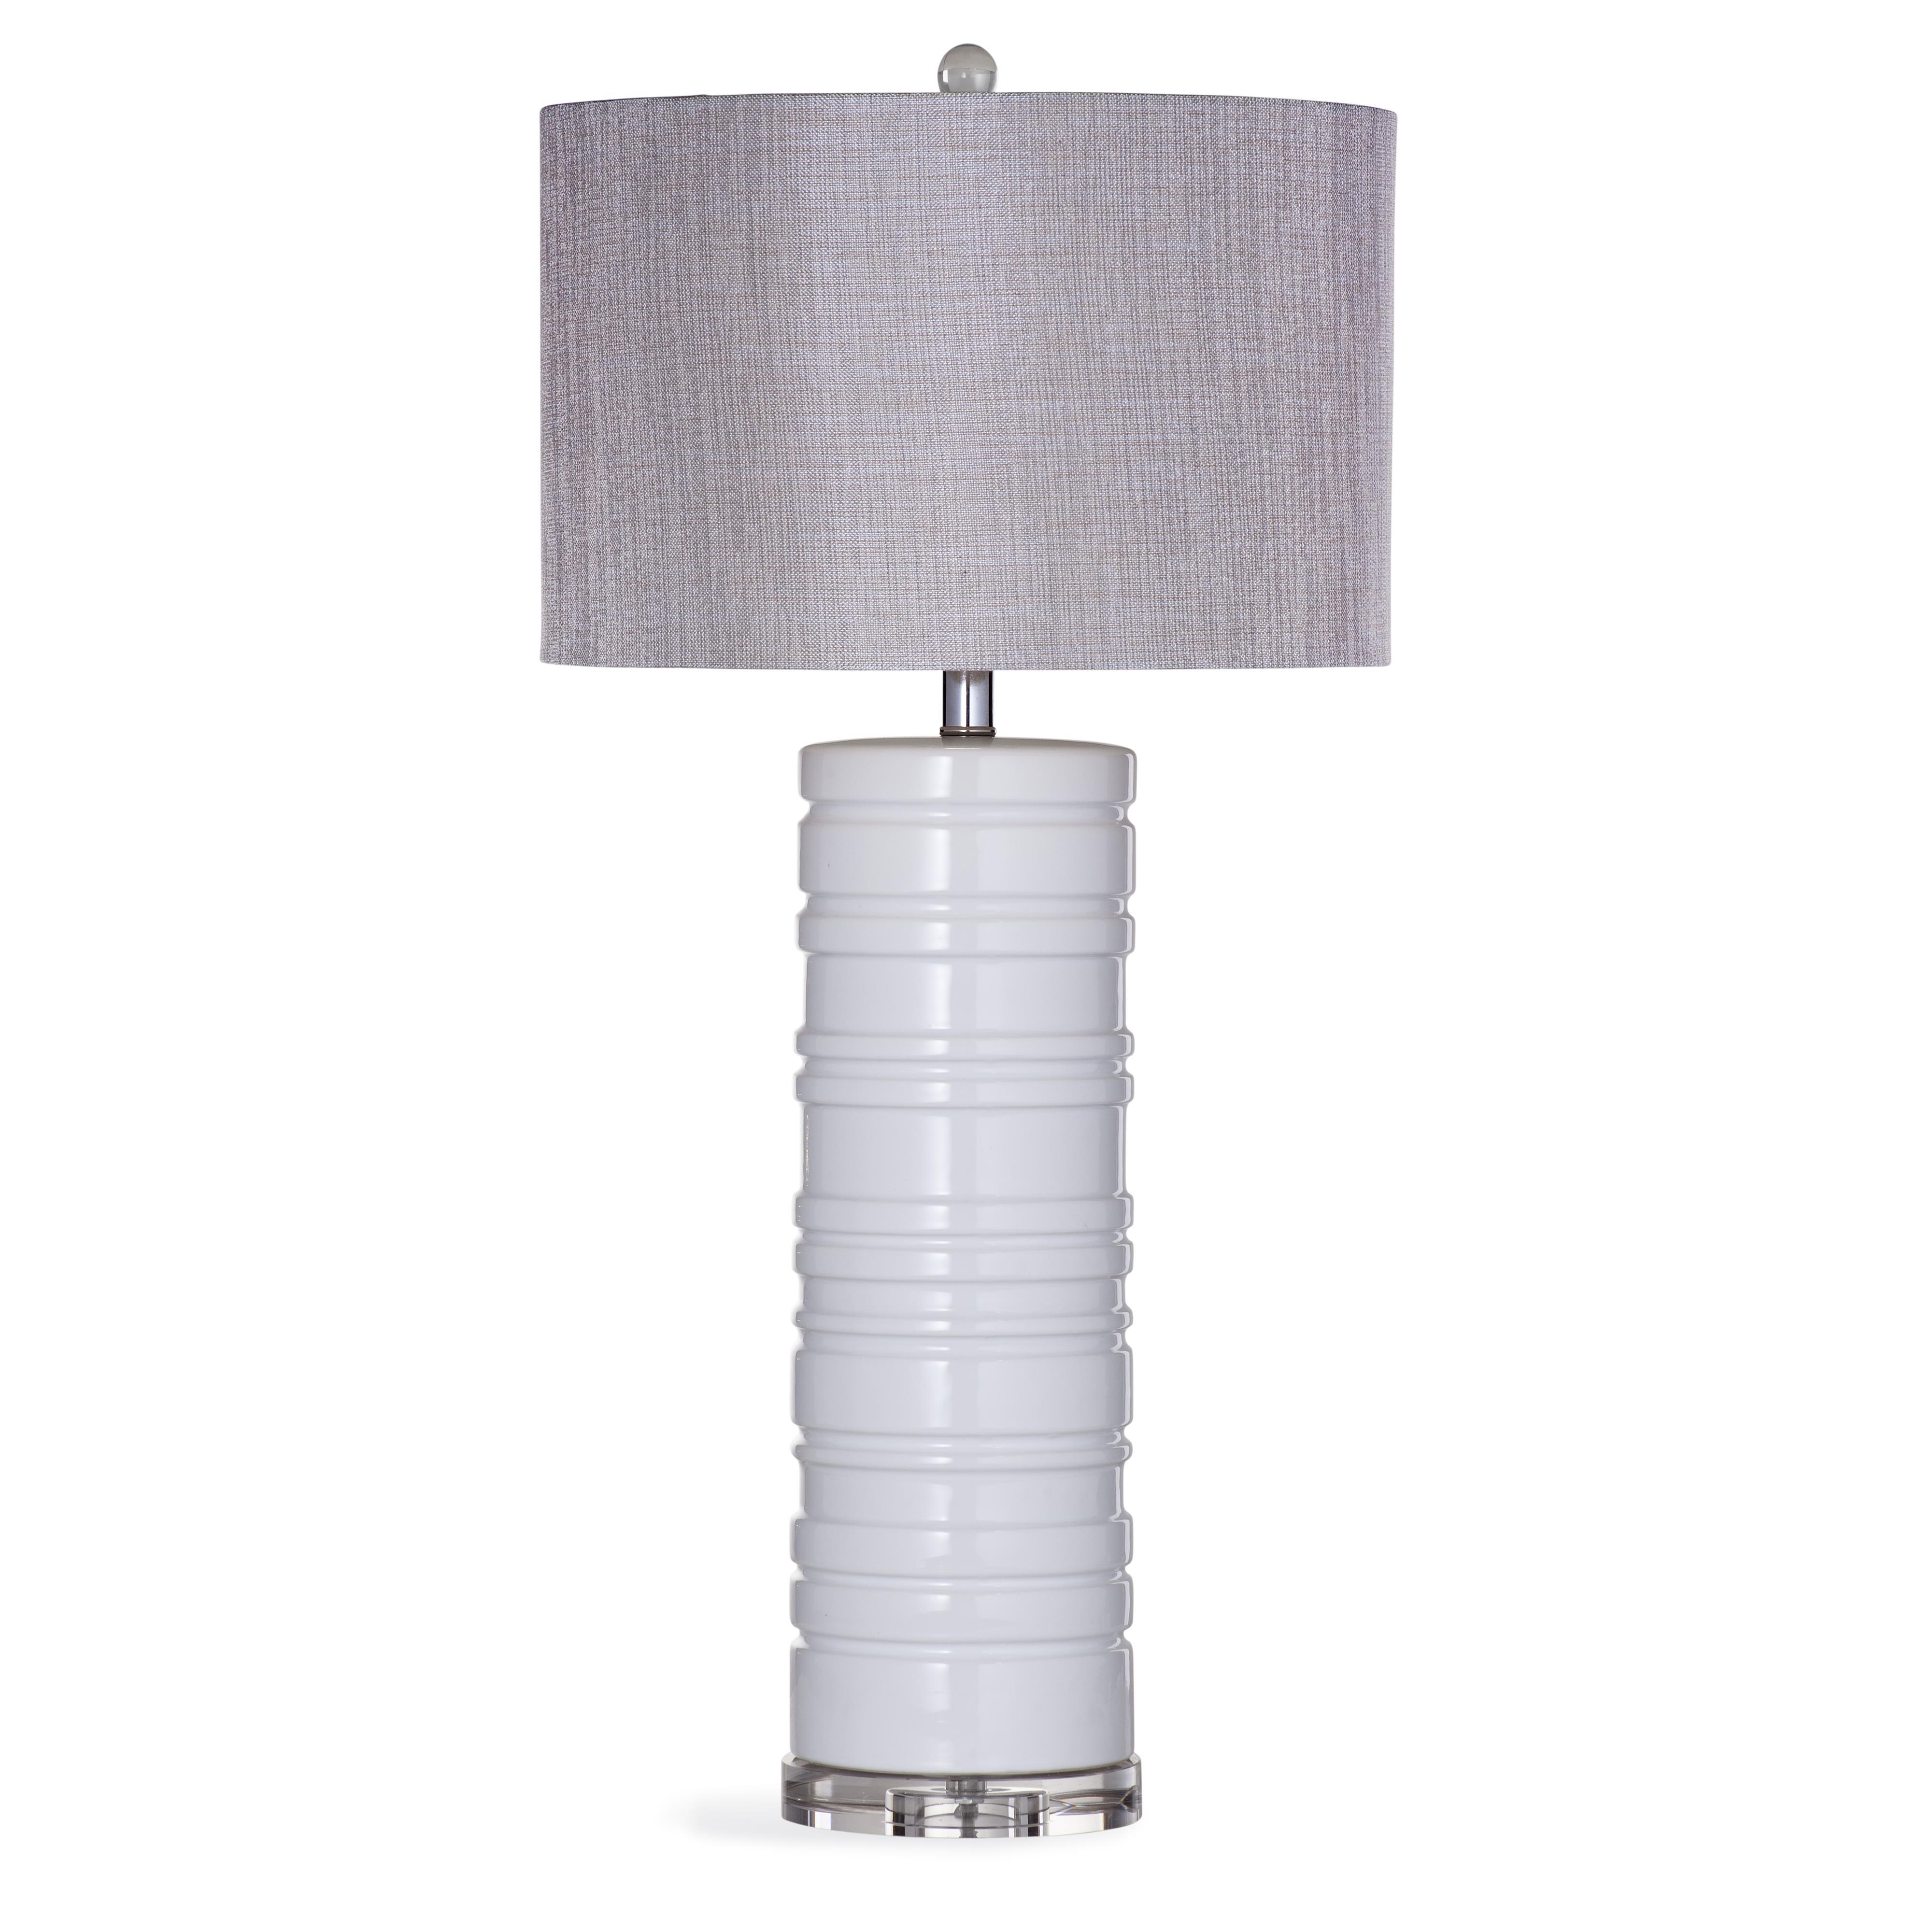 Thoroughly Modern Seneca Table Lamp by Bassett Mirror at Alison Craig Home Furnishings